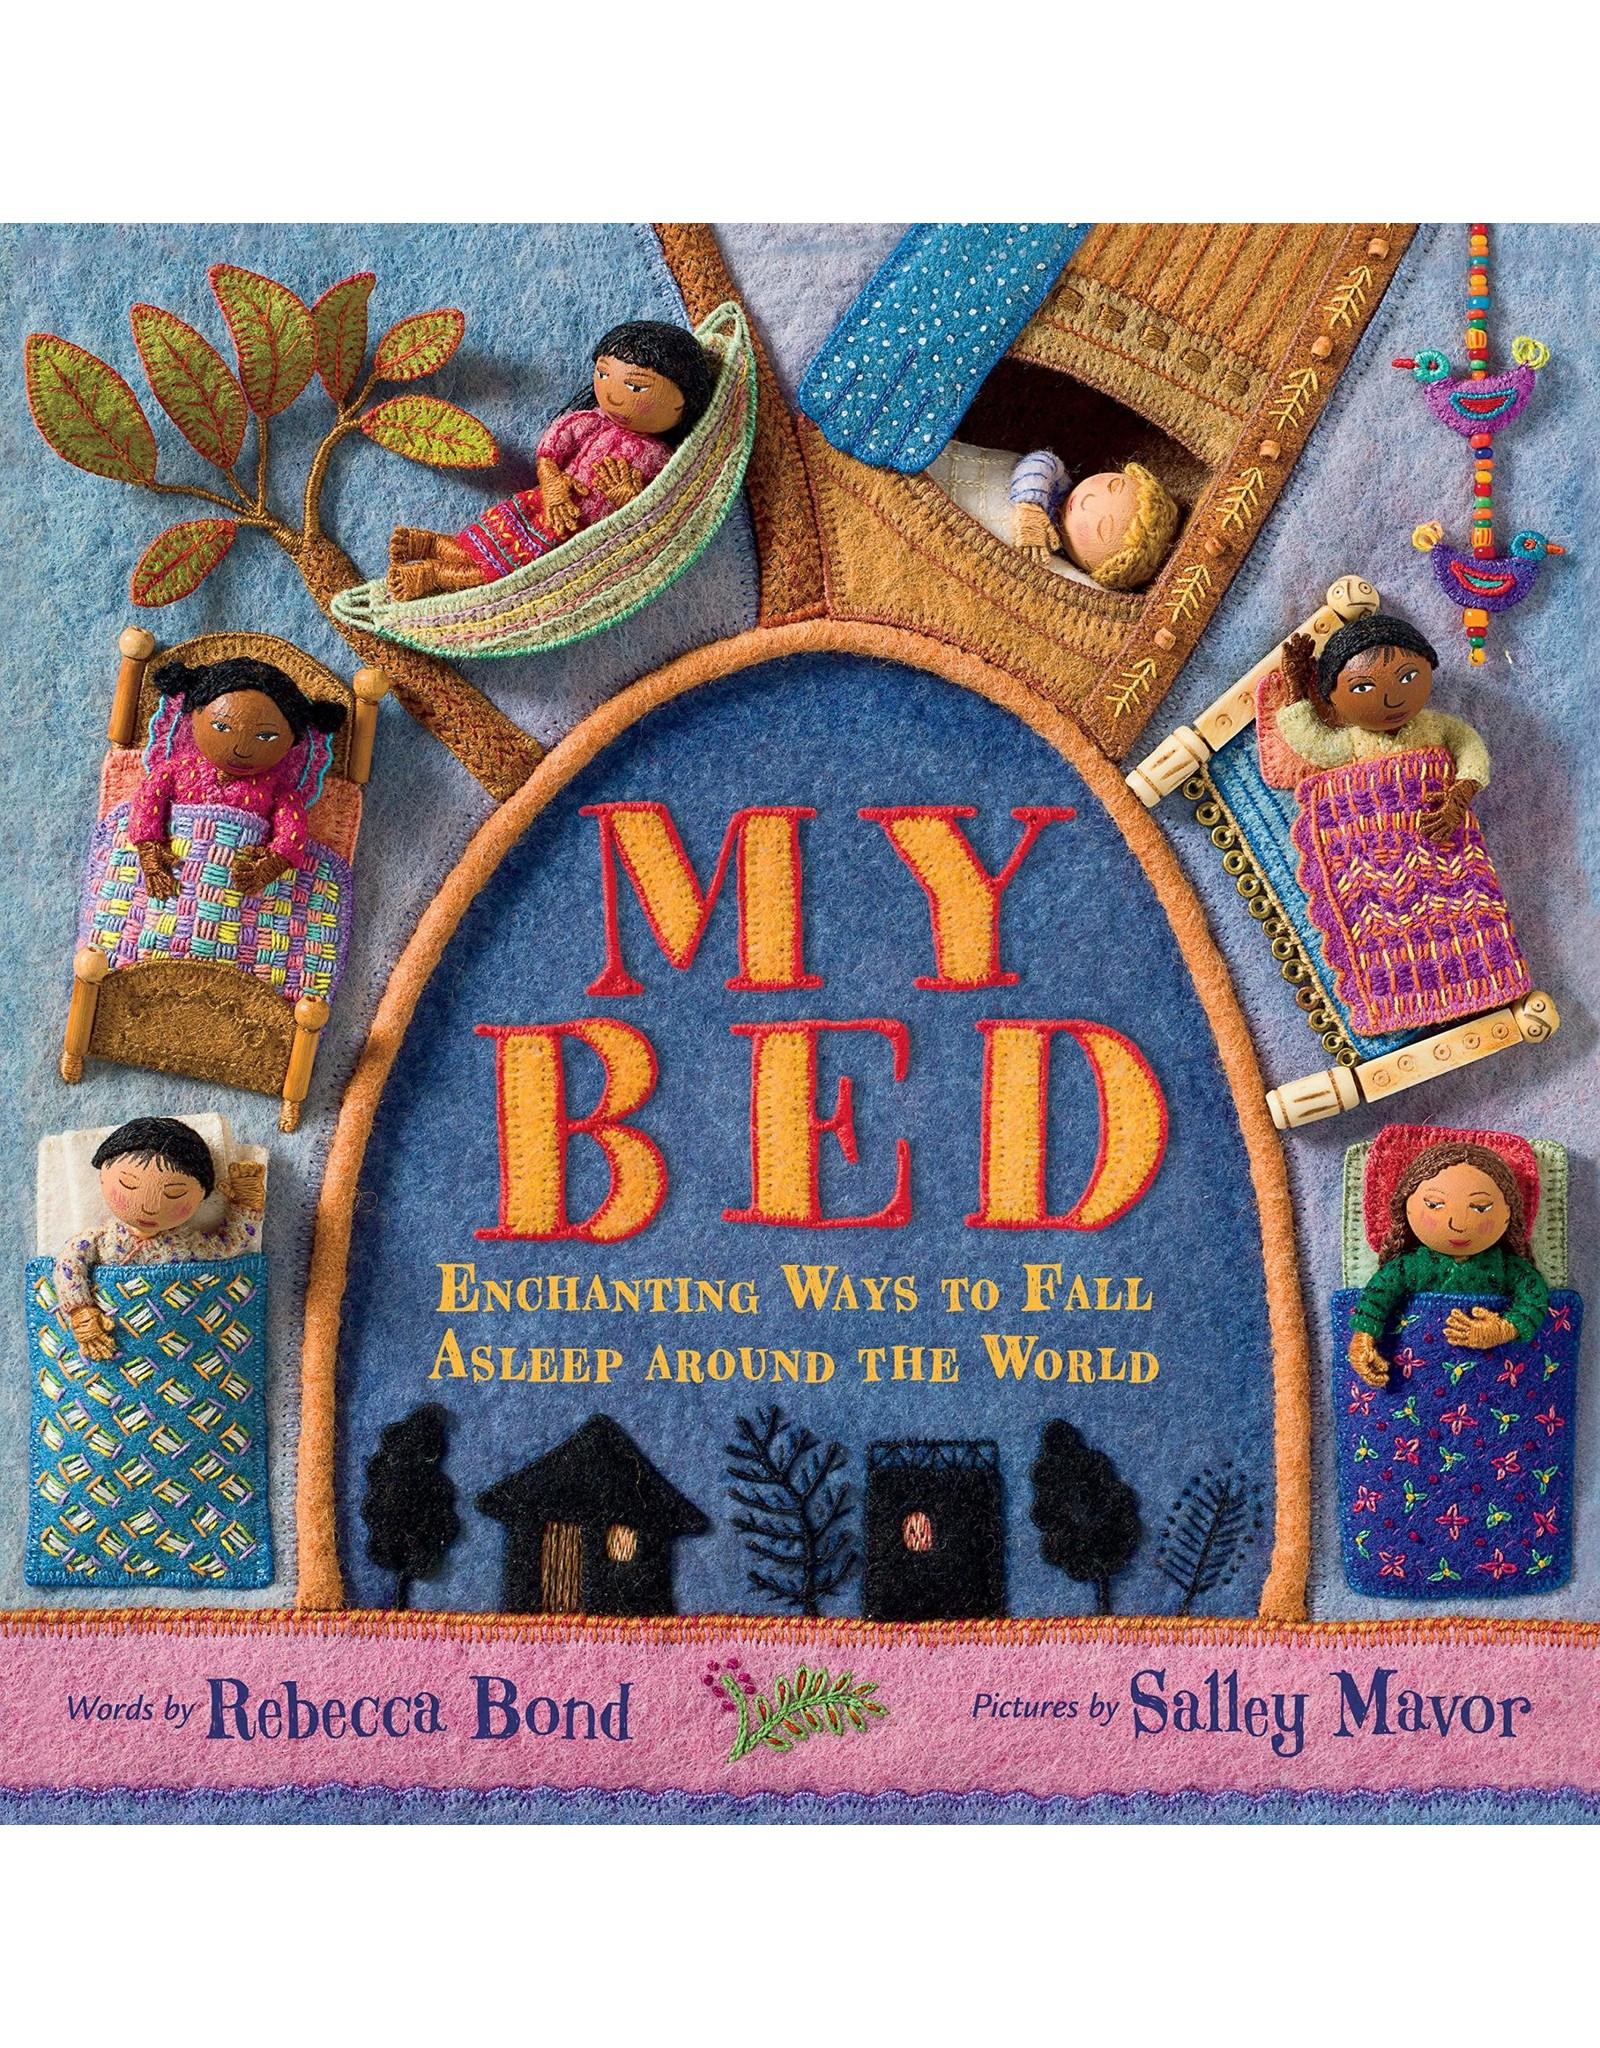 Ingram My Bed: Enchanting Ways to Fall Asleep Around the World